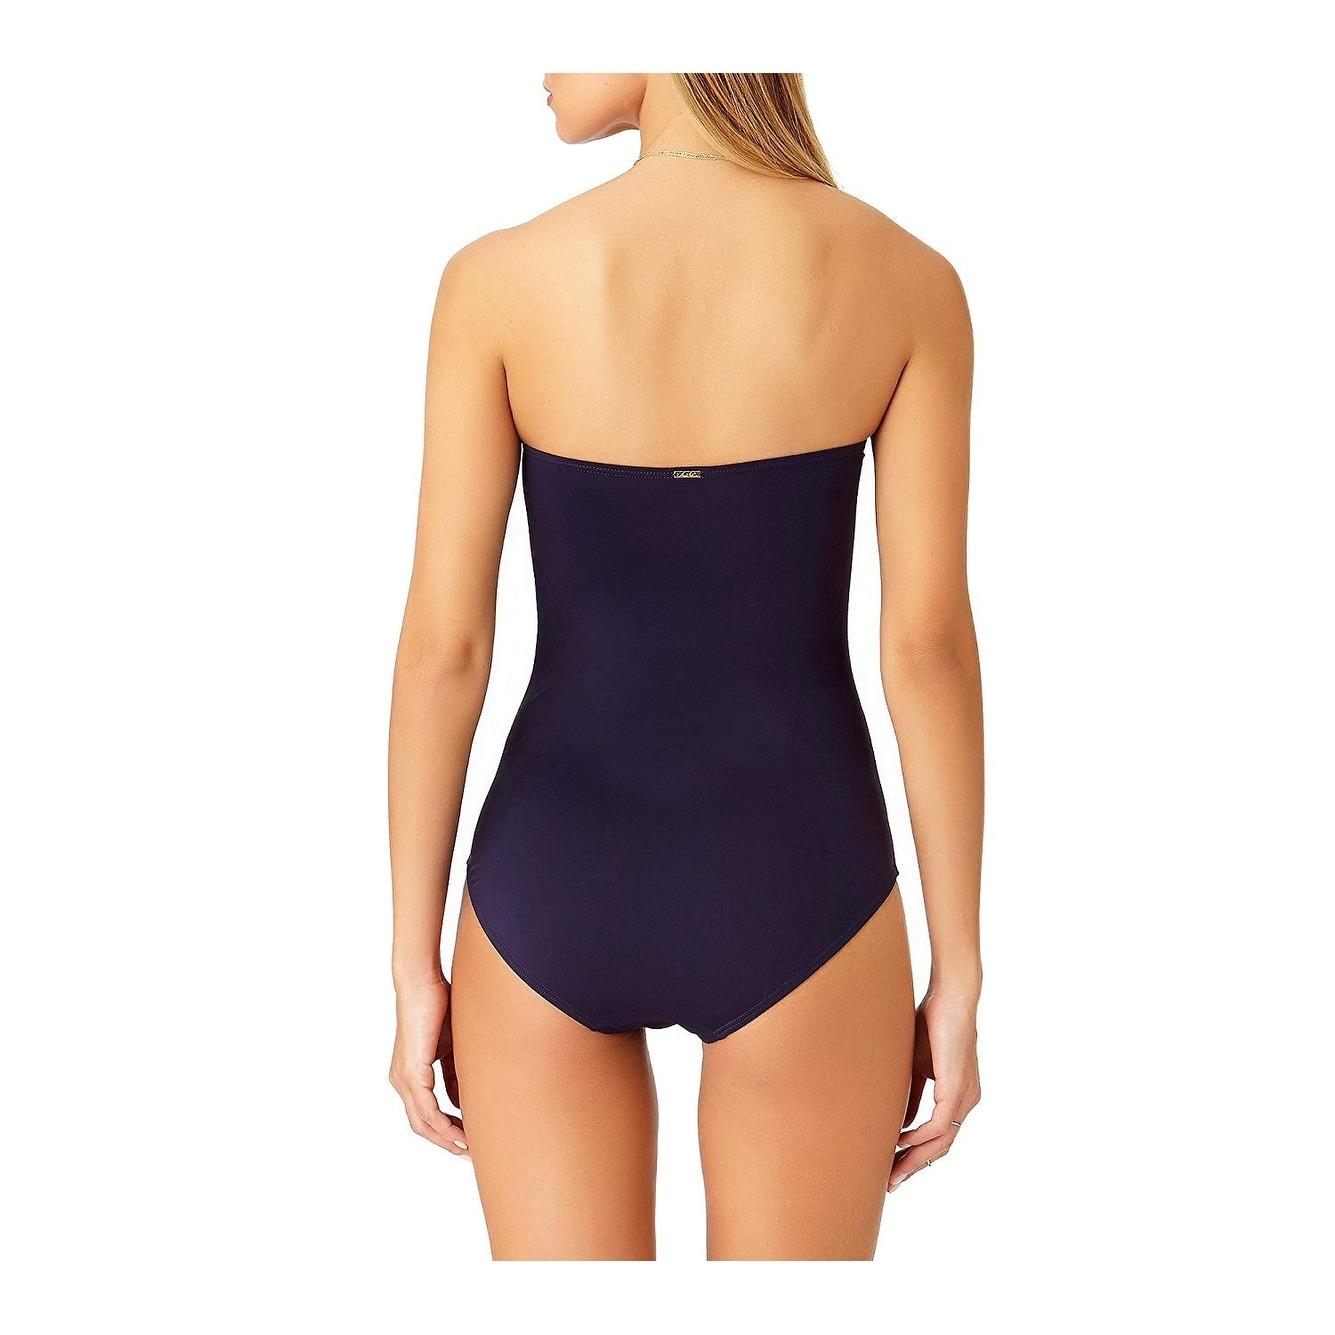 d890e5e4e8b Anne Cole Women Twist Front Shirred One Piece Strapless Swimsuit